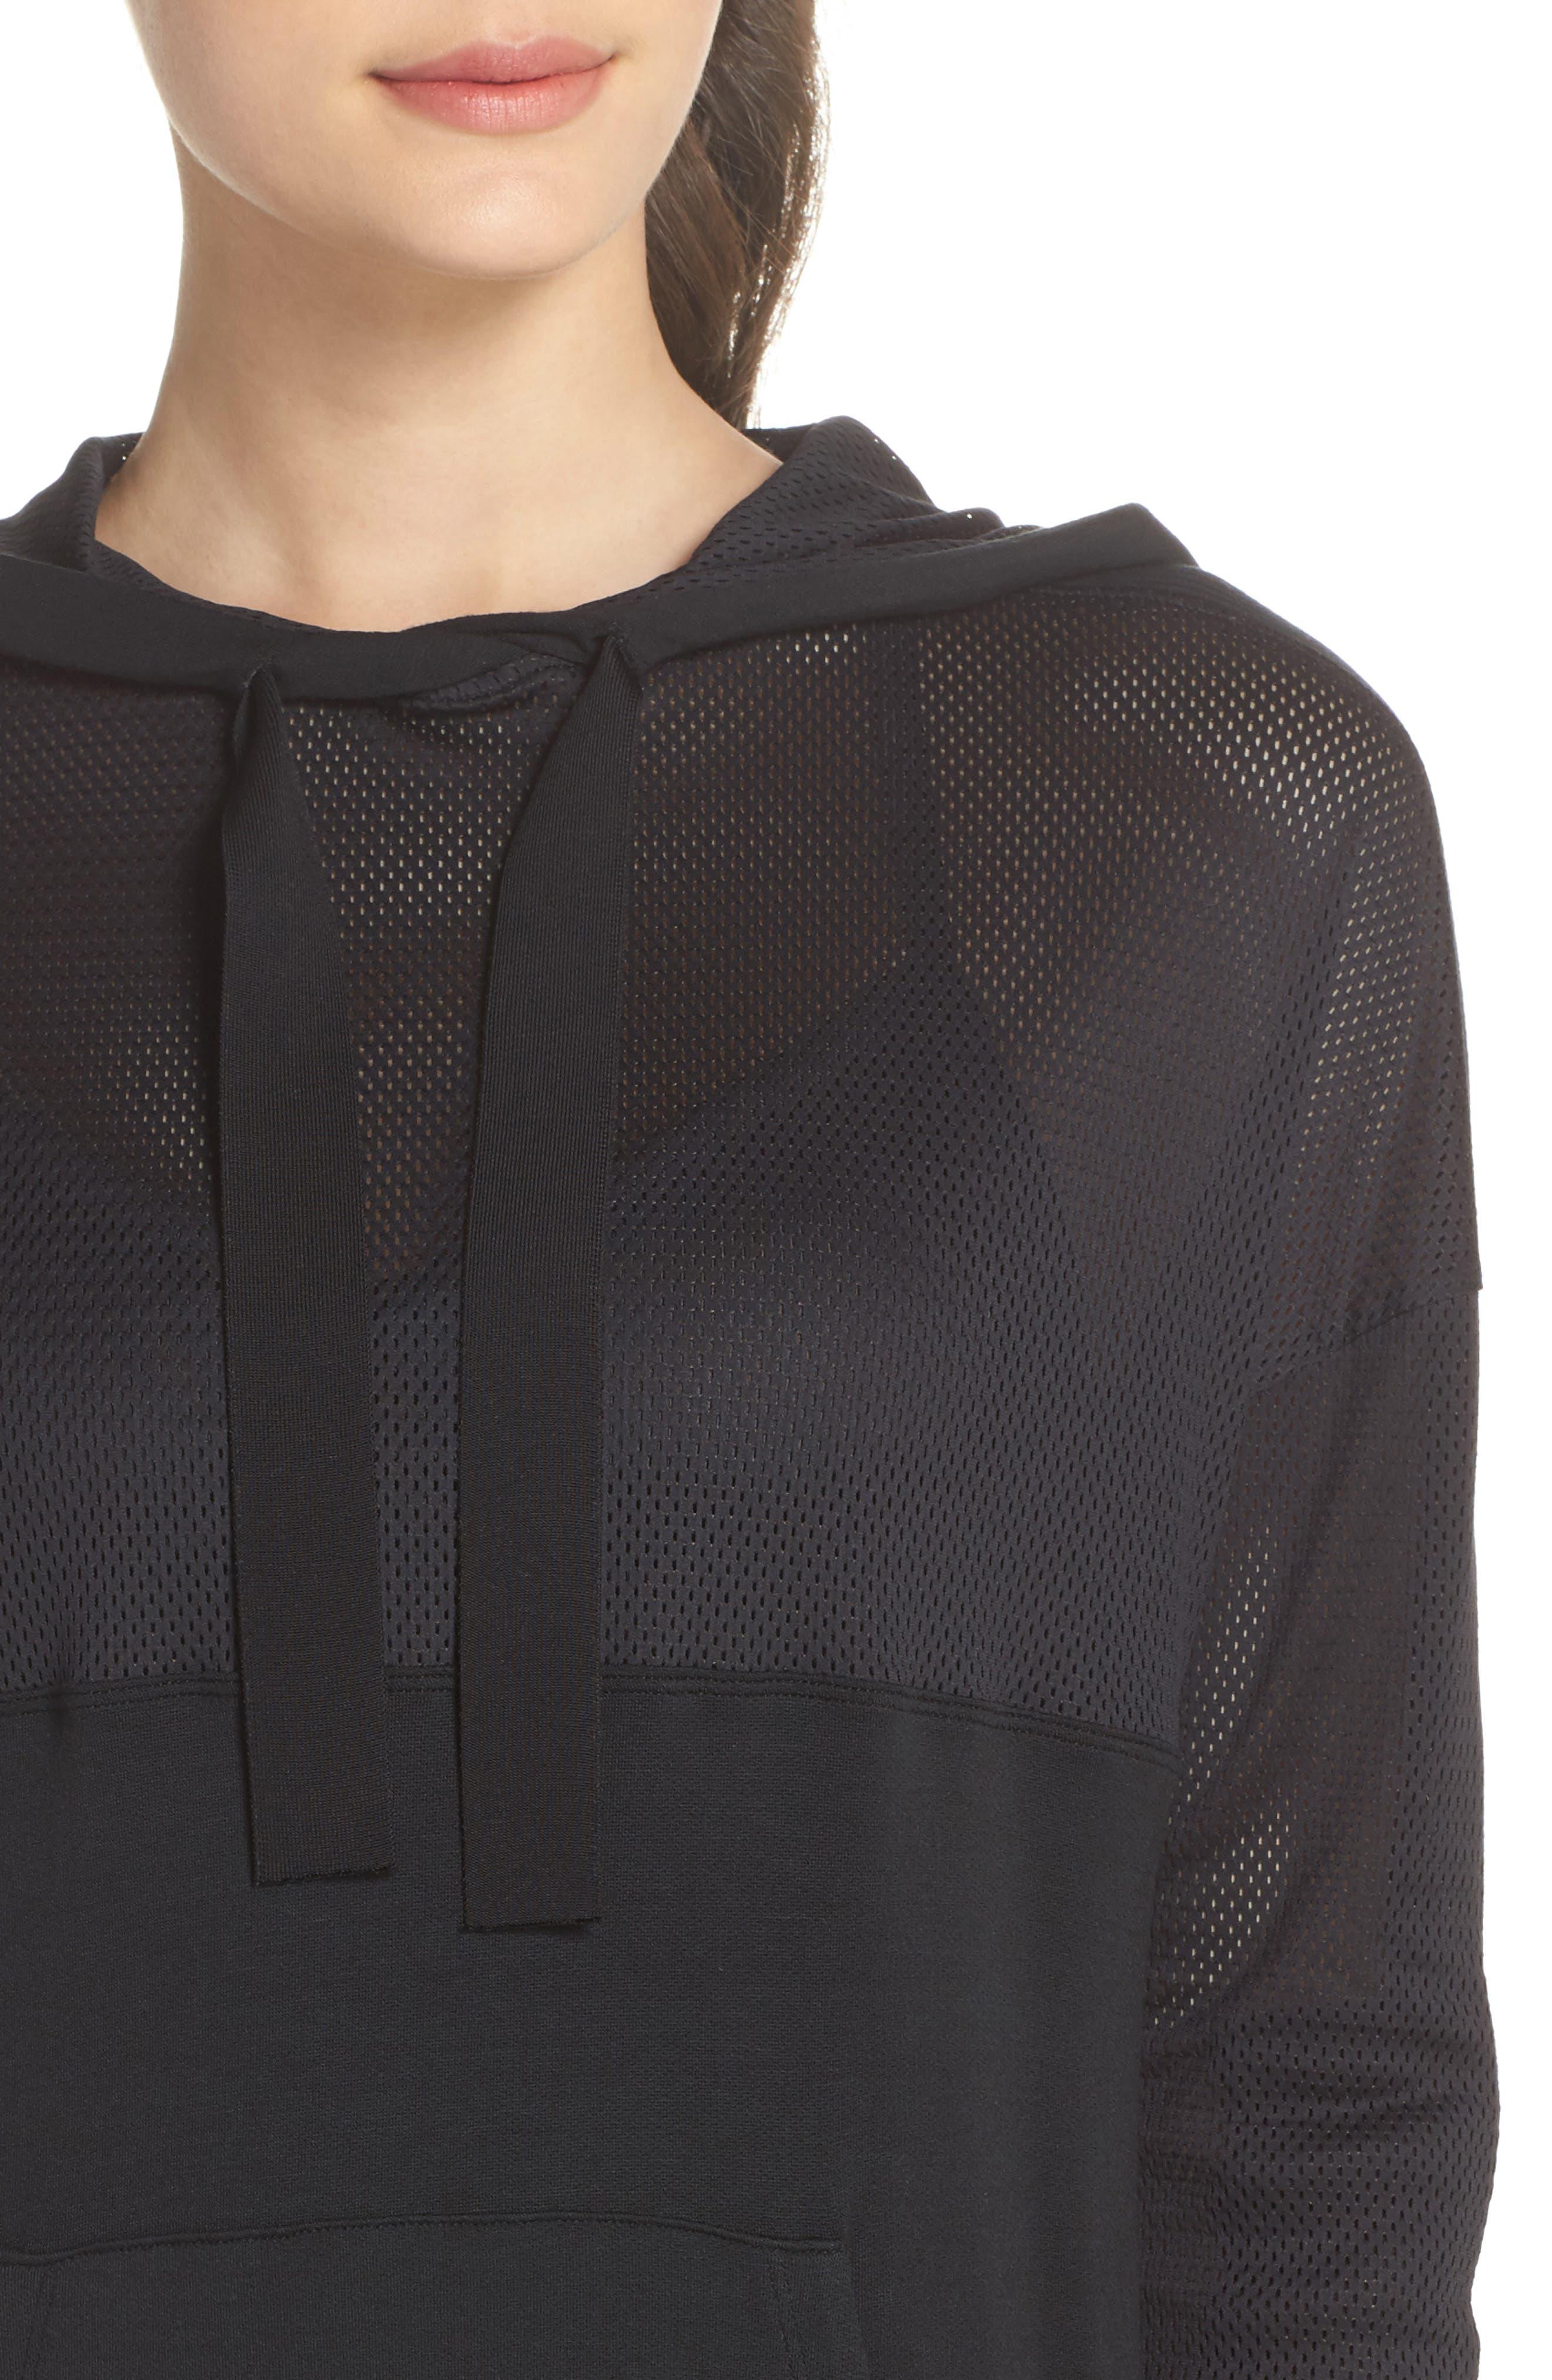 Range Dress,                             Alternate thumbnail 4, color,                             Black